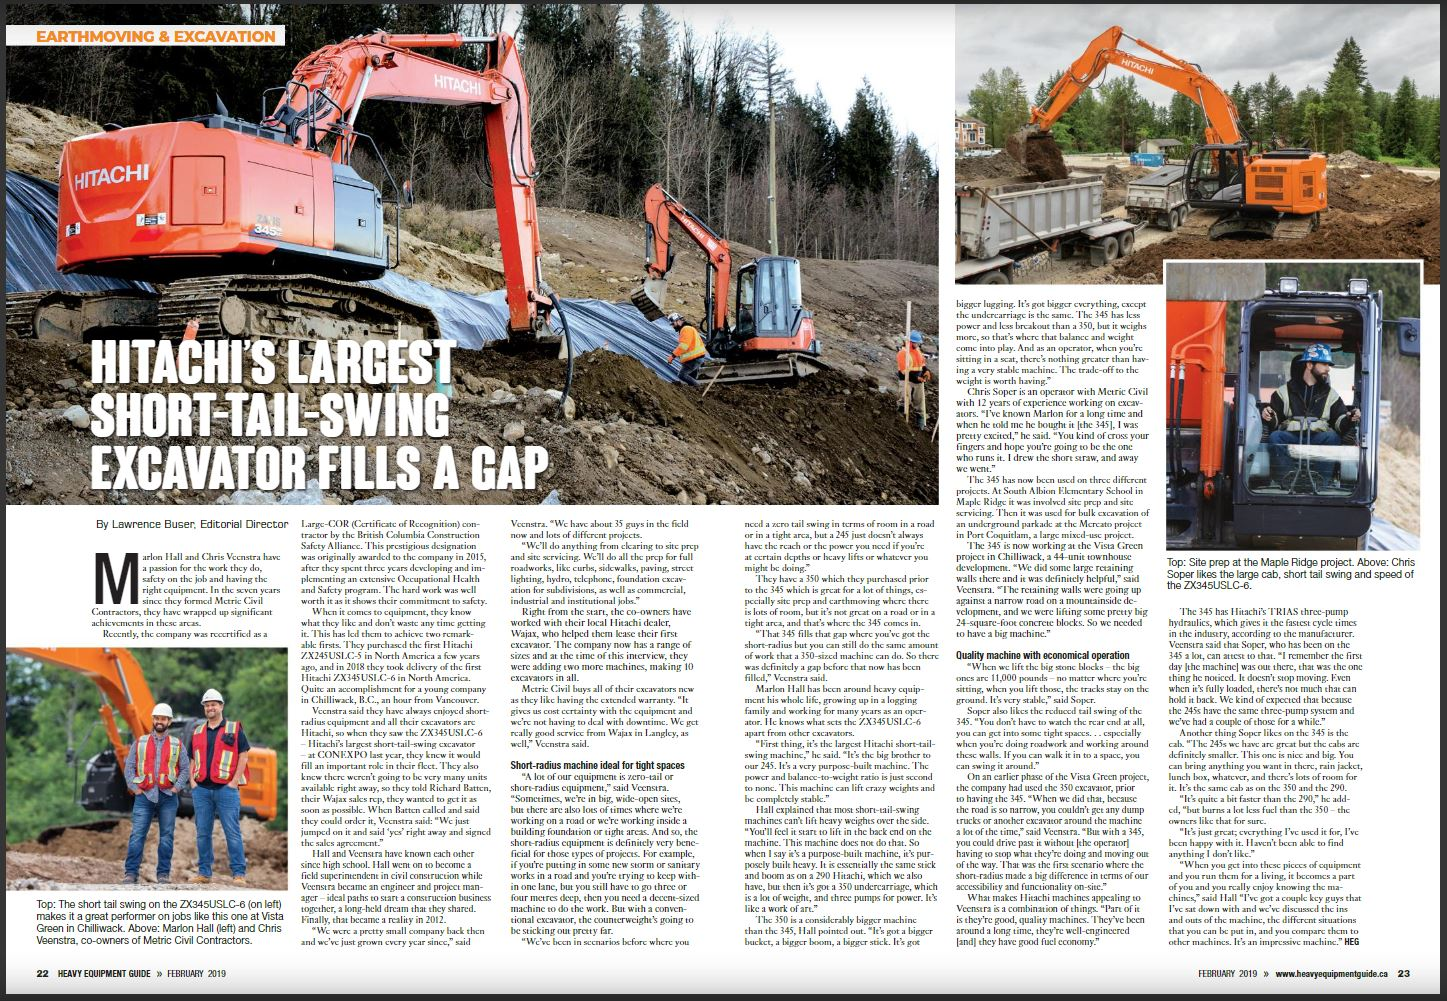 HeavyEquipGuide-article pic.JPG